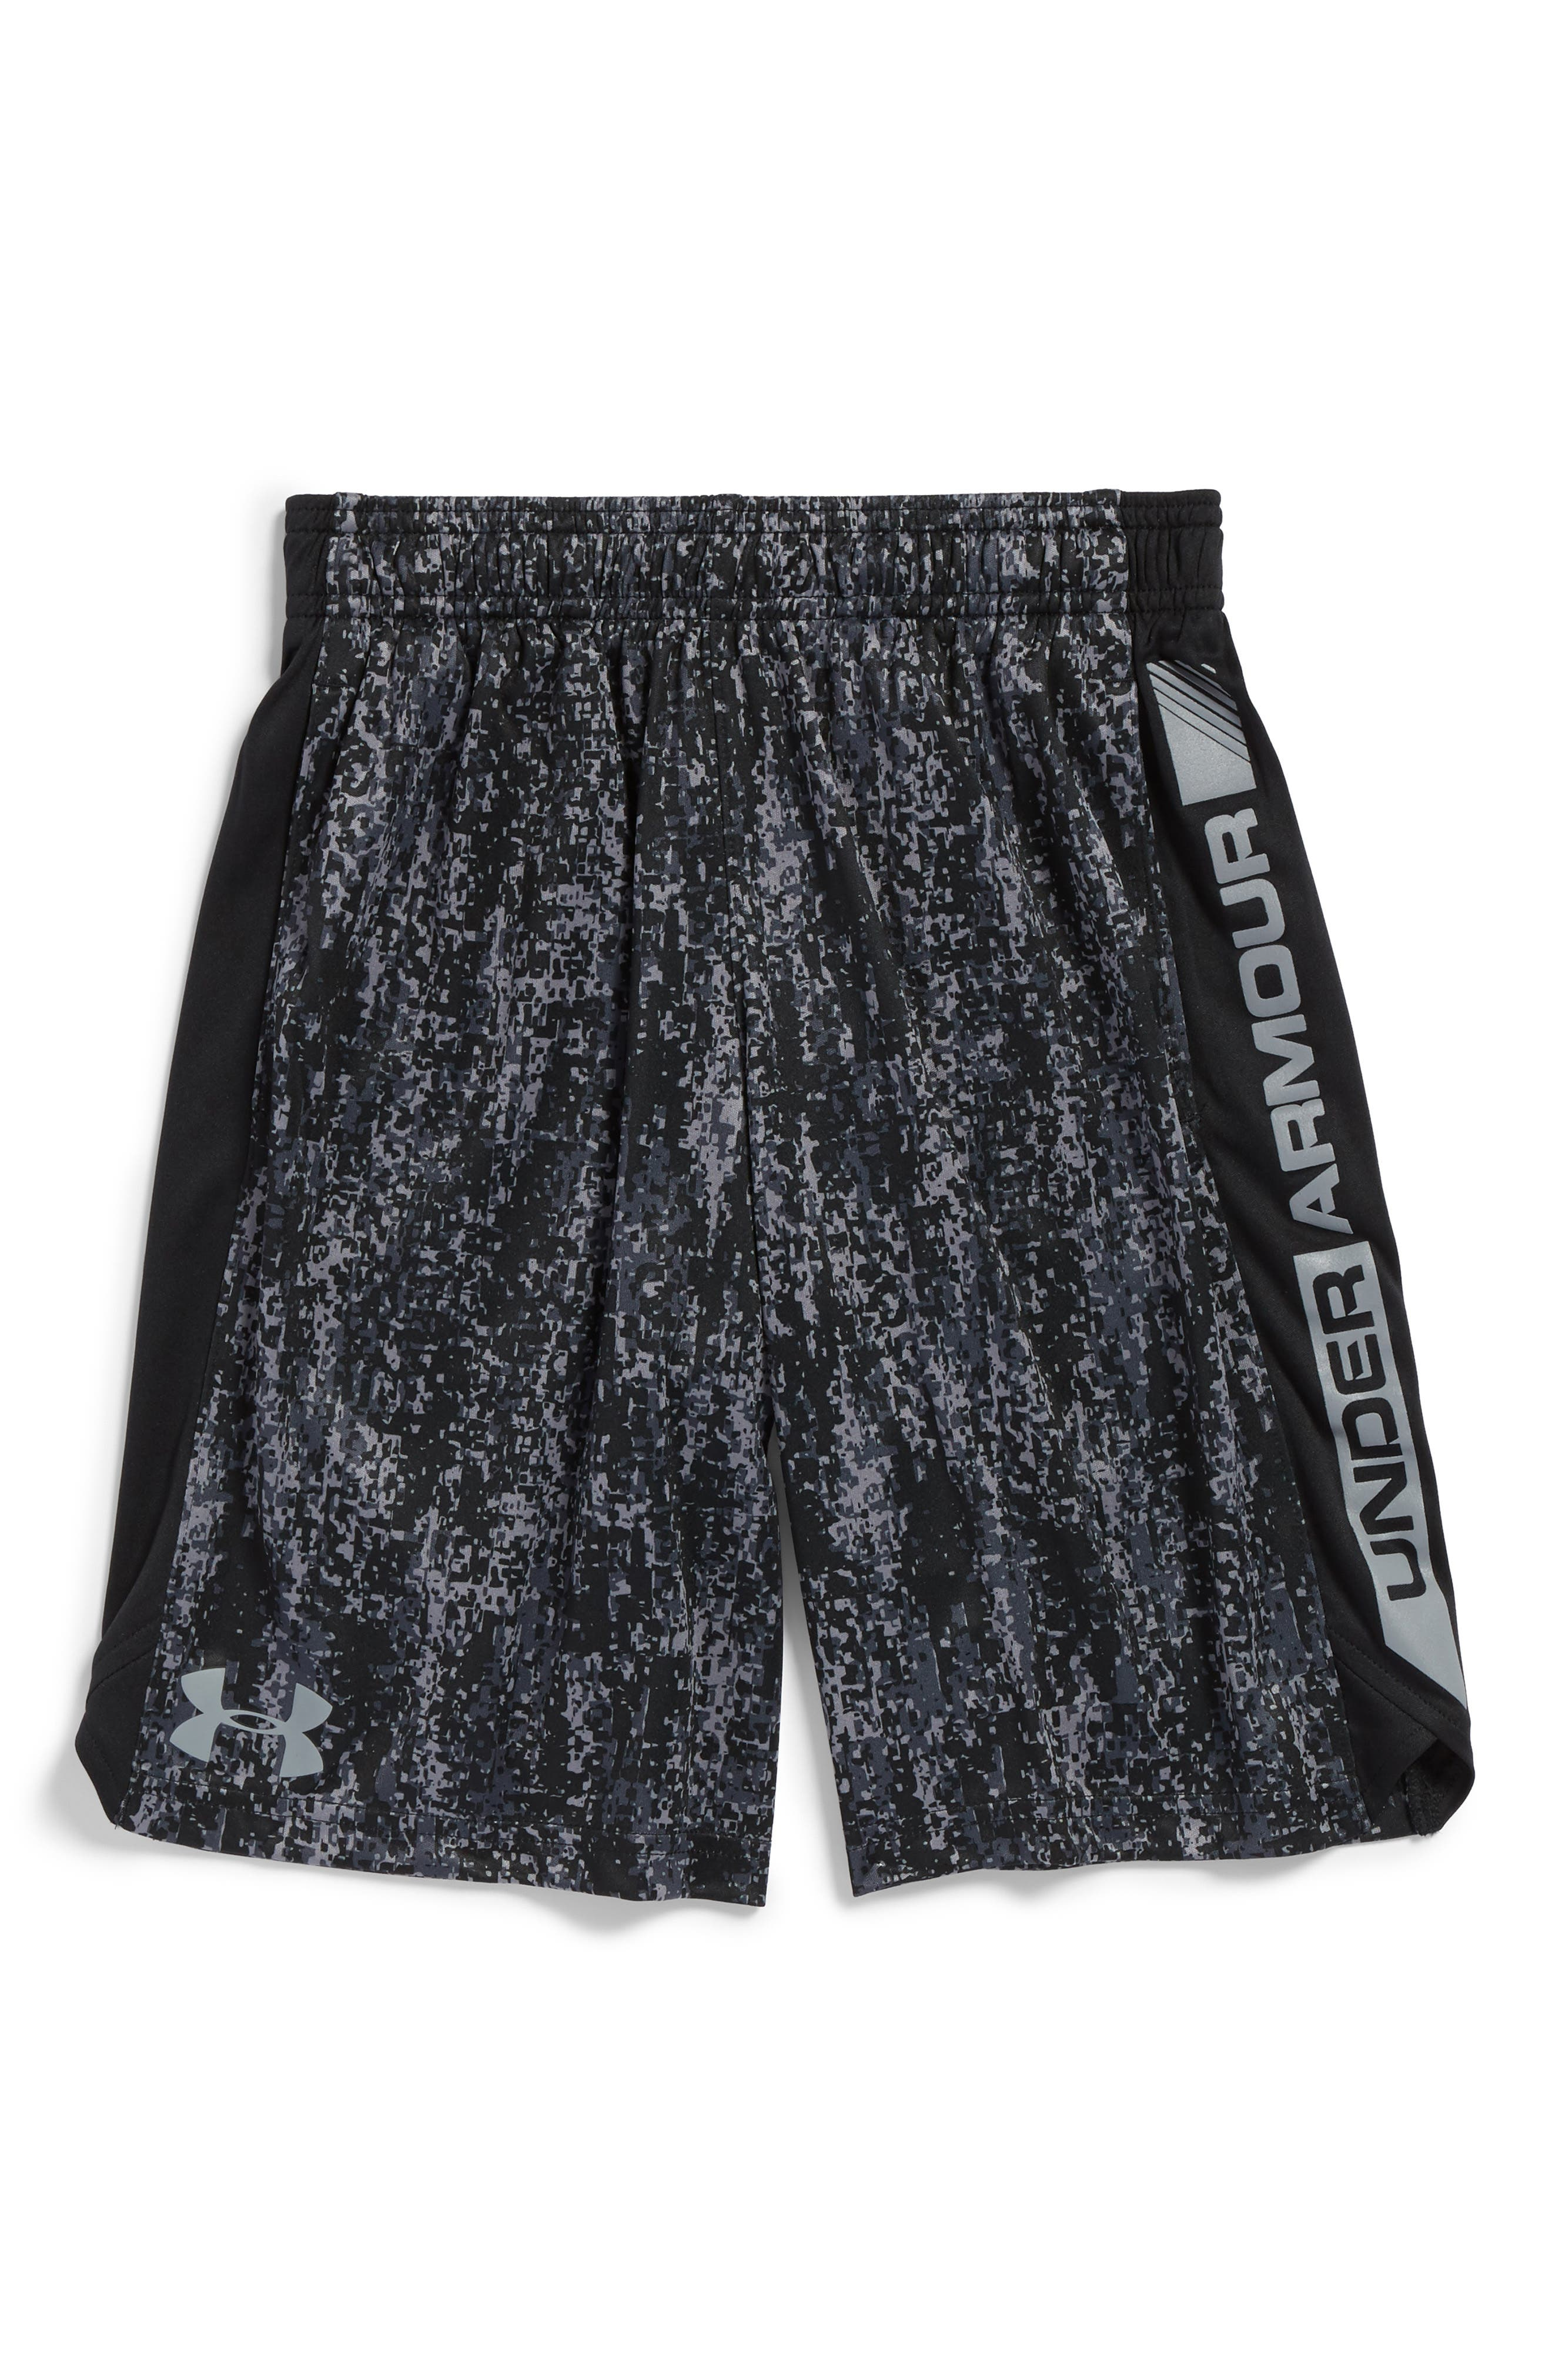 Main Image - Under Armour Eliminator Athletic HeatGear® Shorts (Little Boys & Big Boys)